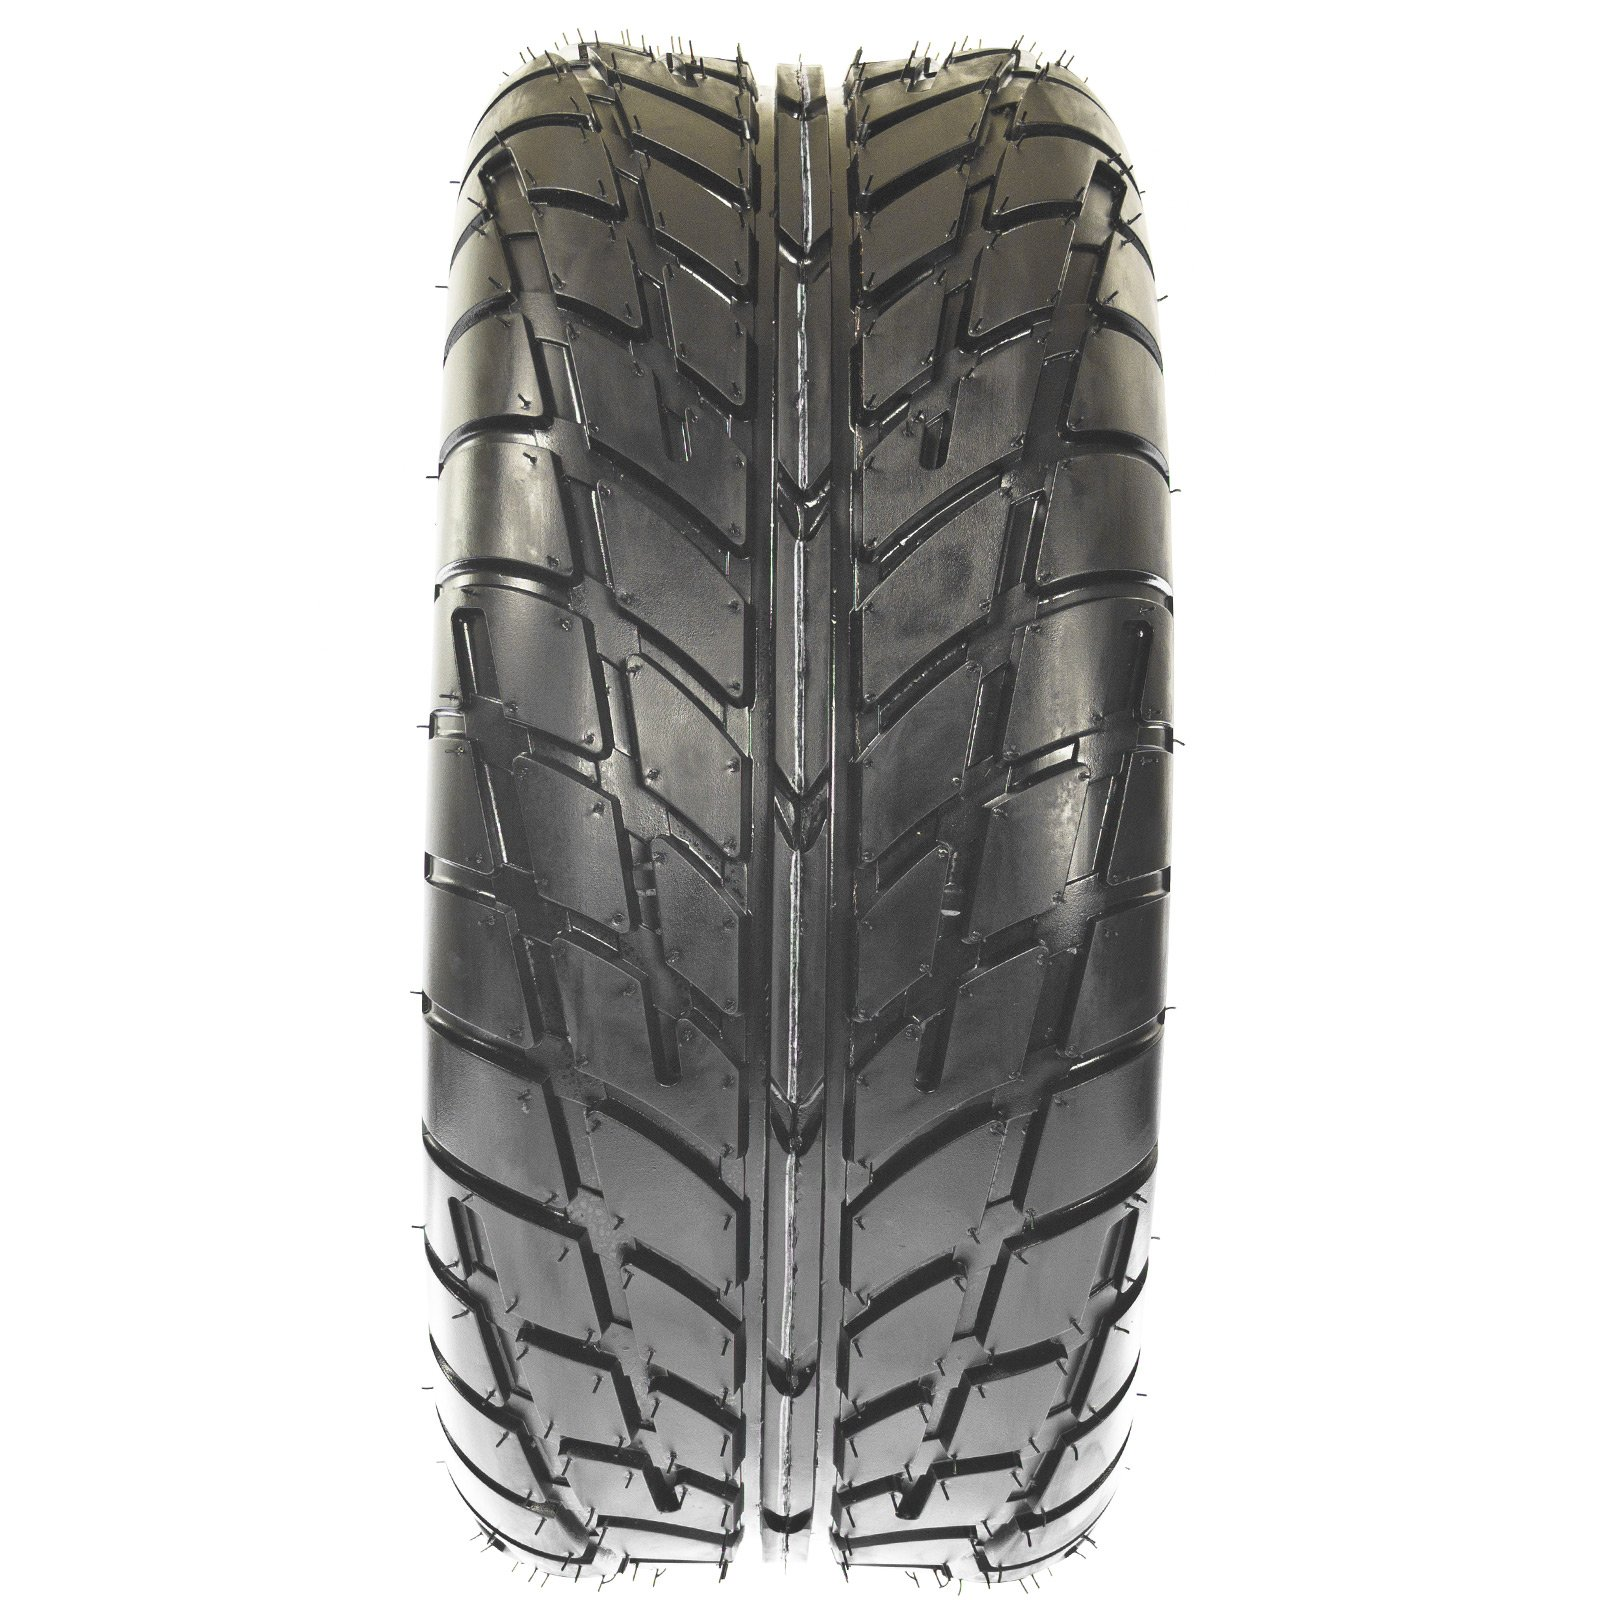 SunF Quad ATV Road Race Tires 225/45-10 225 45 10 4 PR A021 (Full set of 4) by SunF (Image #8)